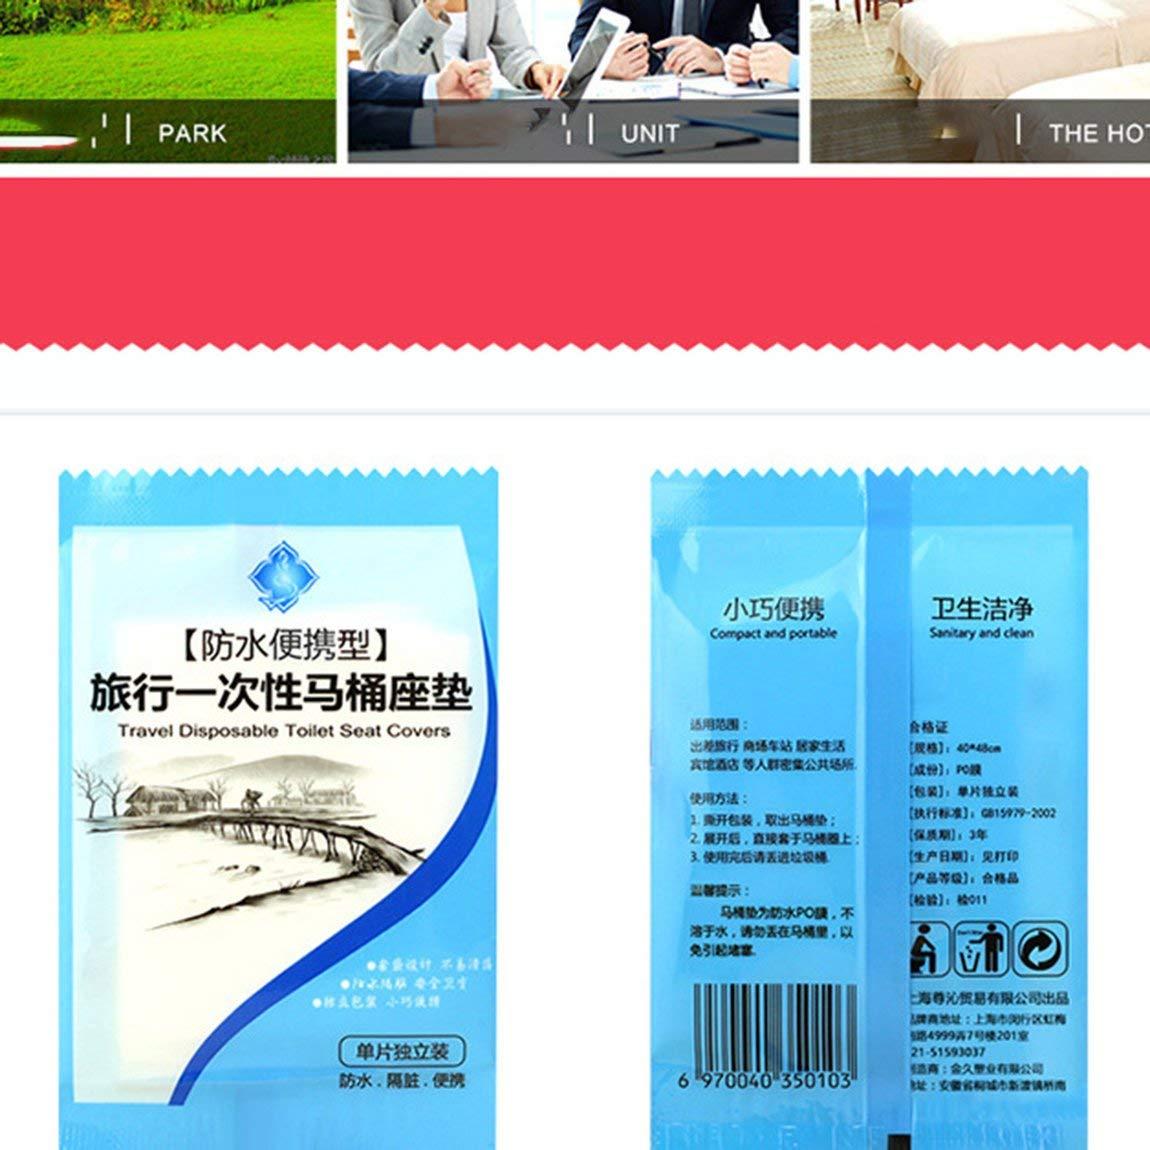 73JohnPol Travel Business Toilet Seat Cover Cuscino monouso Impermeabile per WC tranparent